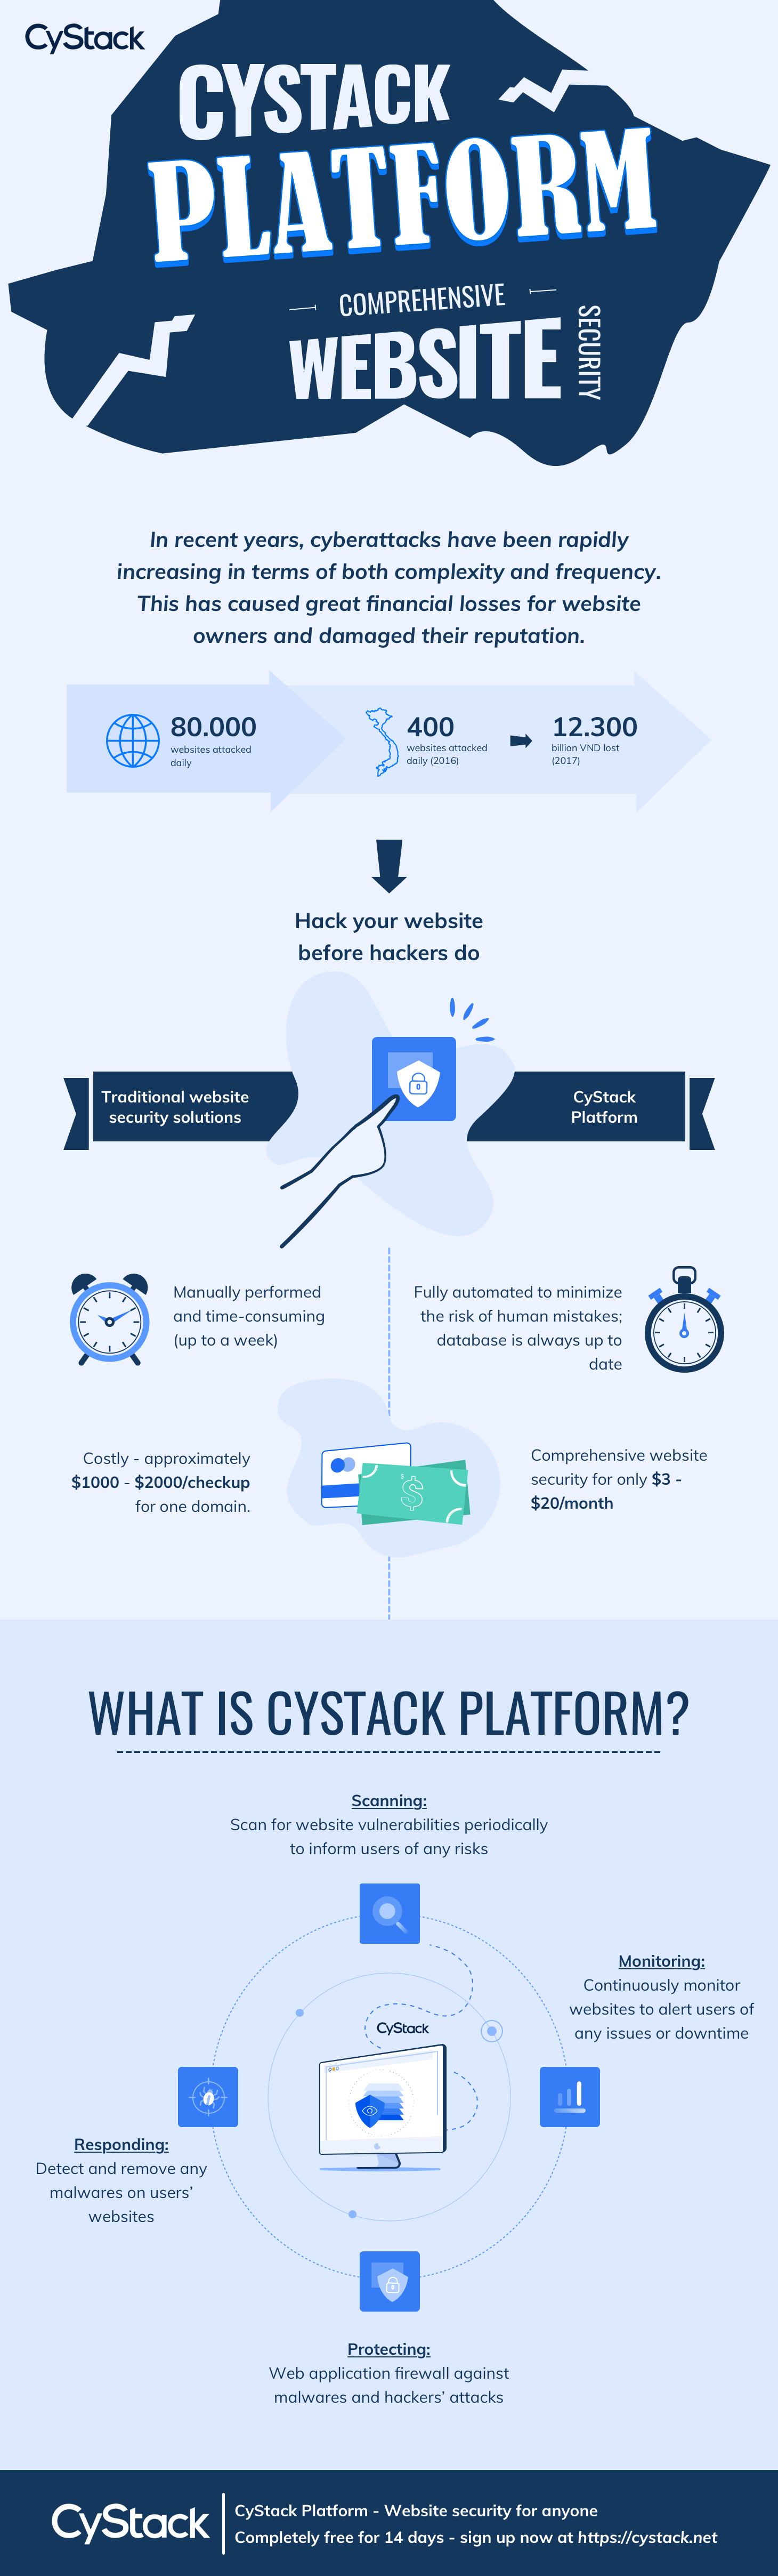 cystack platform comprehensive website security infographic